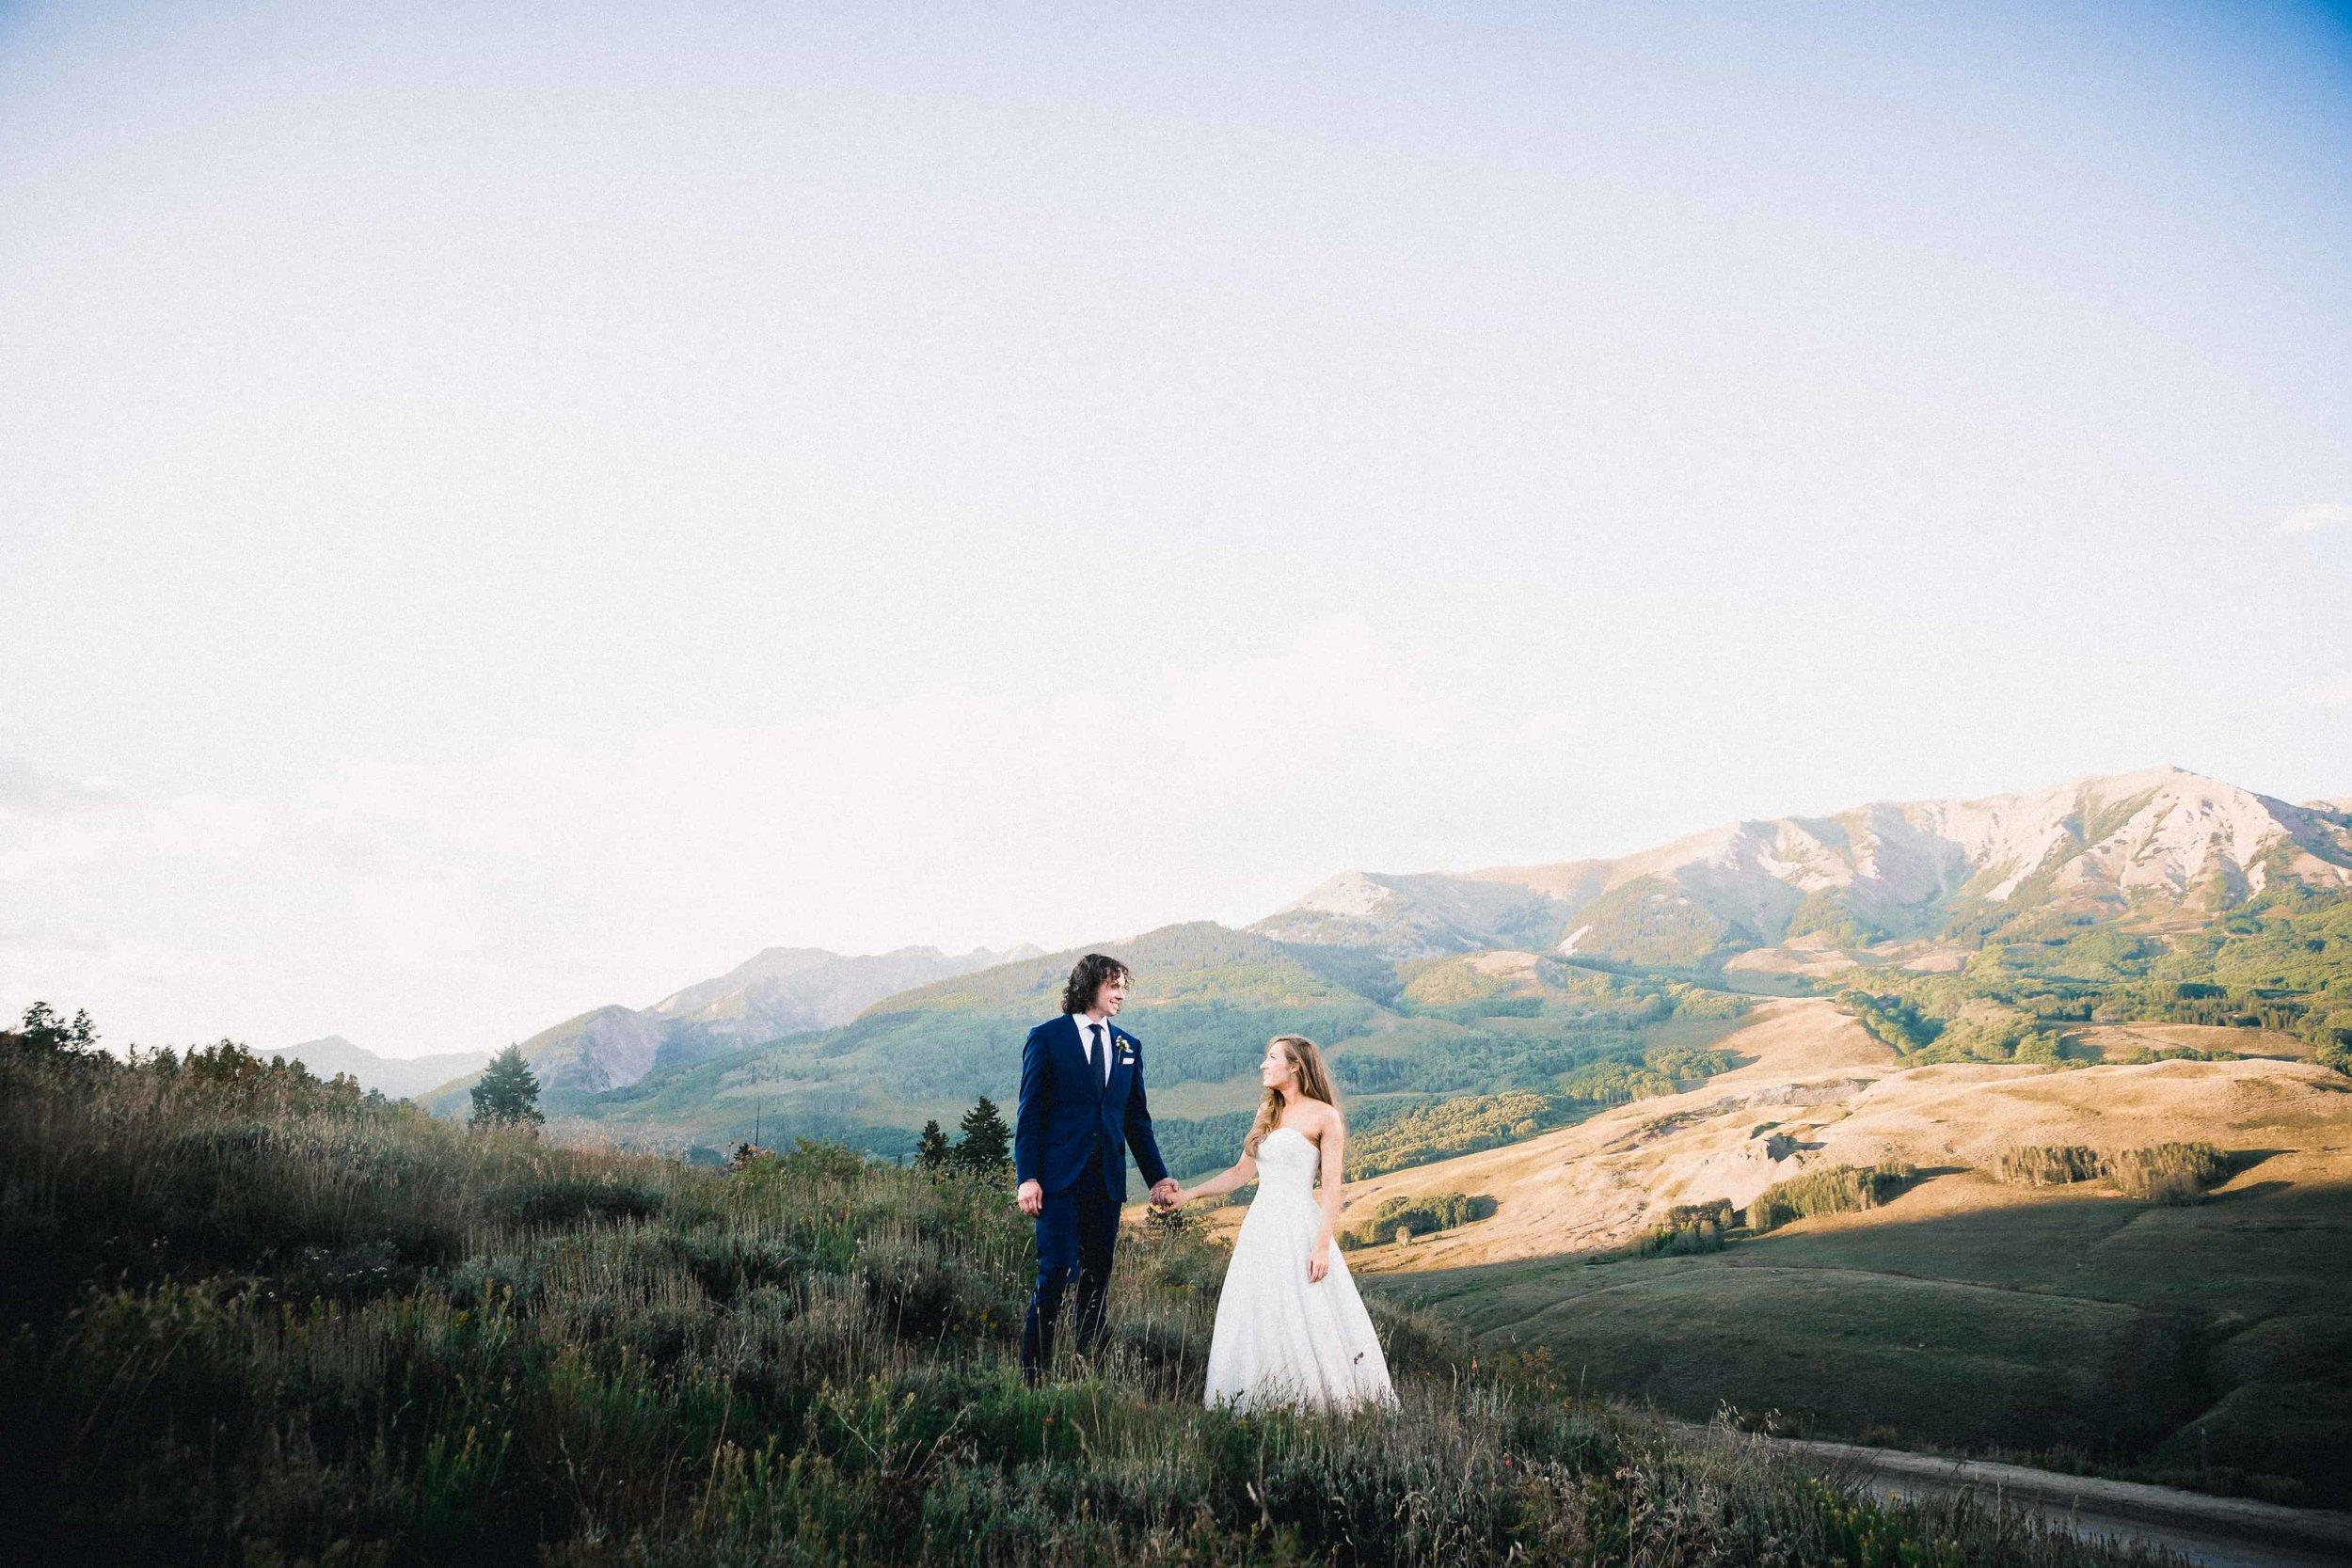 Wedding Photography should feel epic, not awkward    Contact